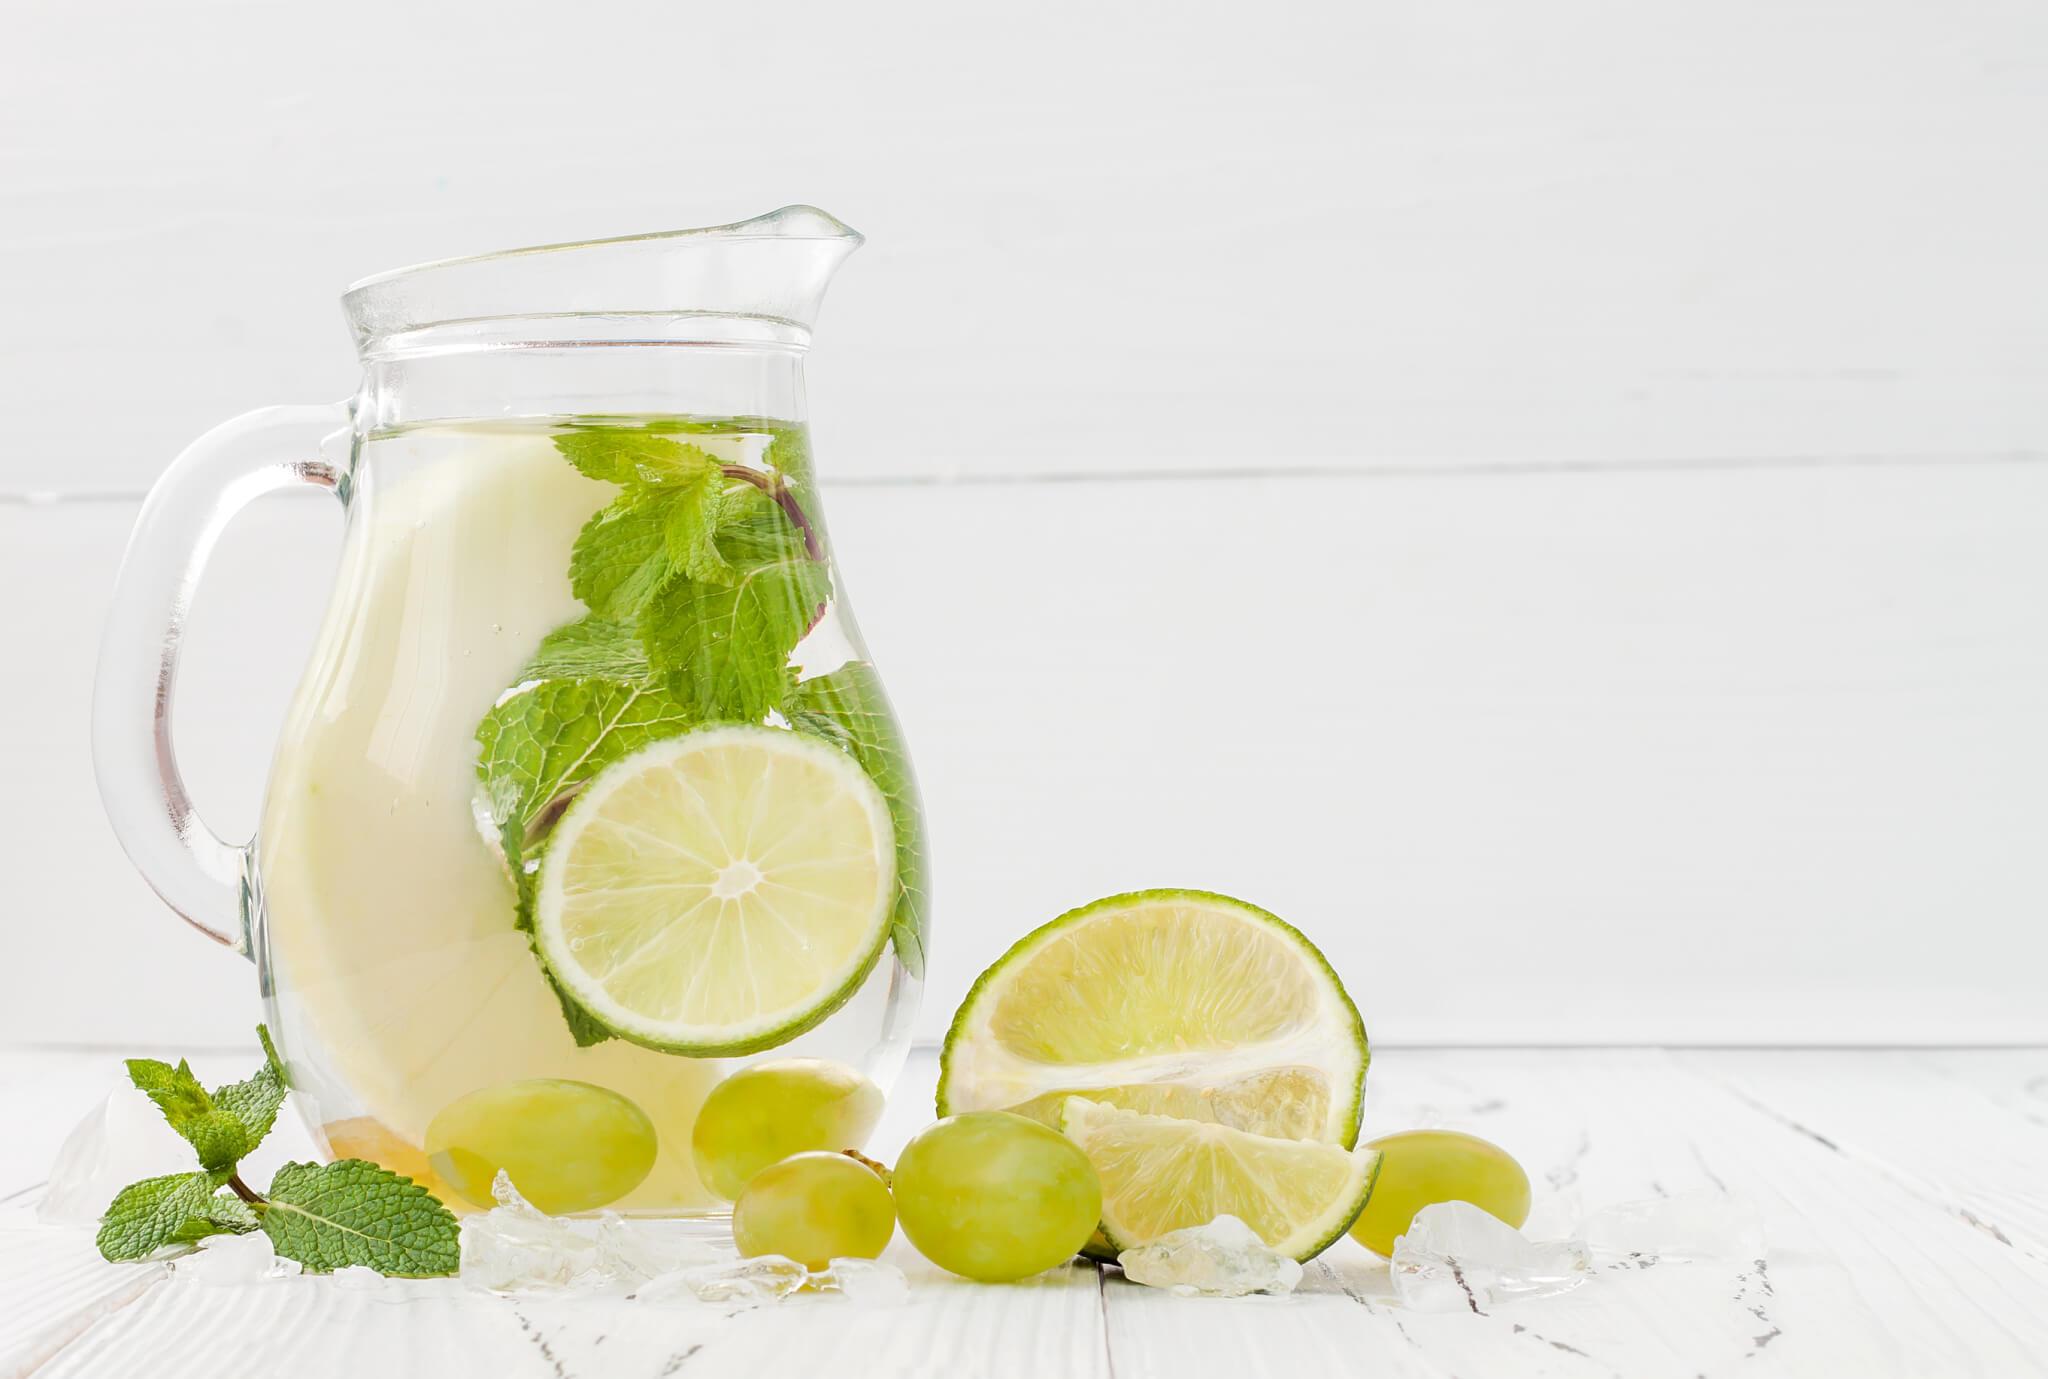 7 simple detox tips